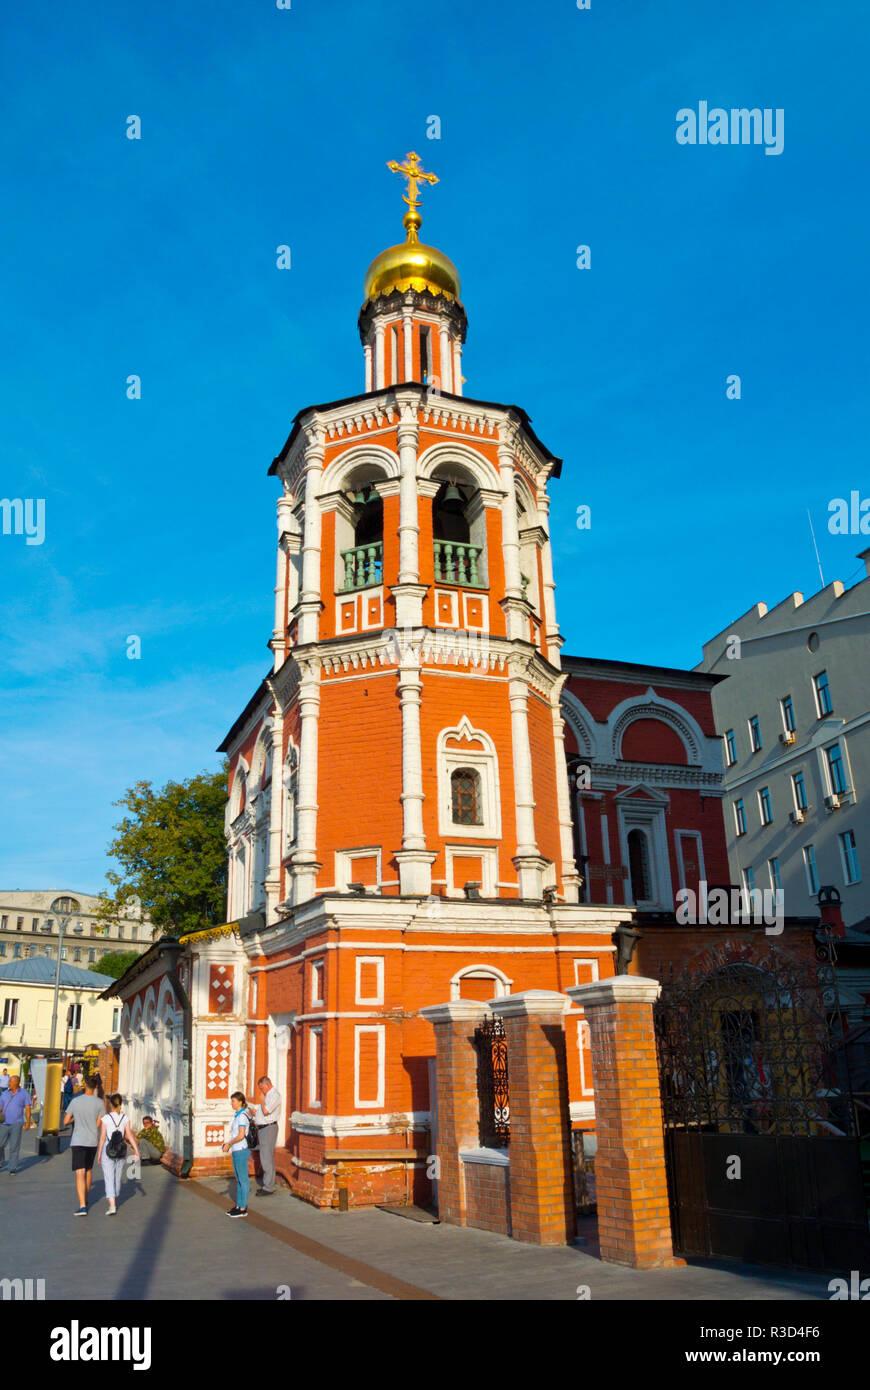 Church of All Saints na Kulichkakh, from 1689, Slavyanskaya Square, Kitay Gorod, Moscow, Russia - Stock Image